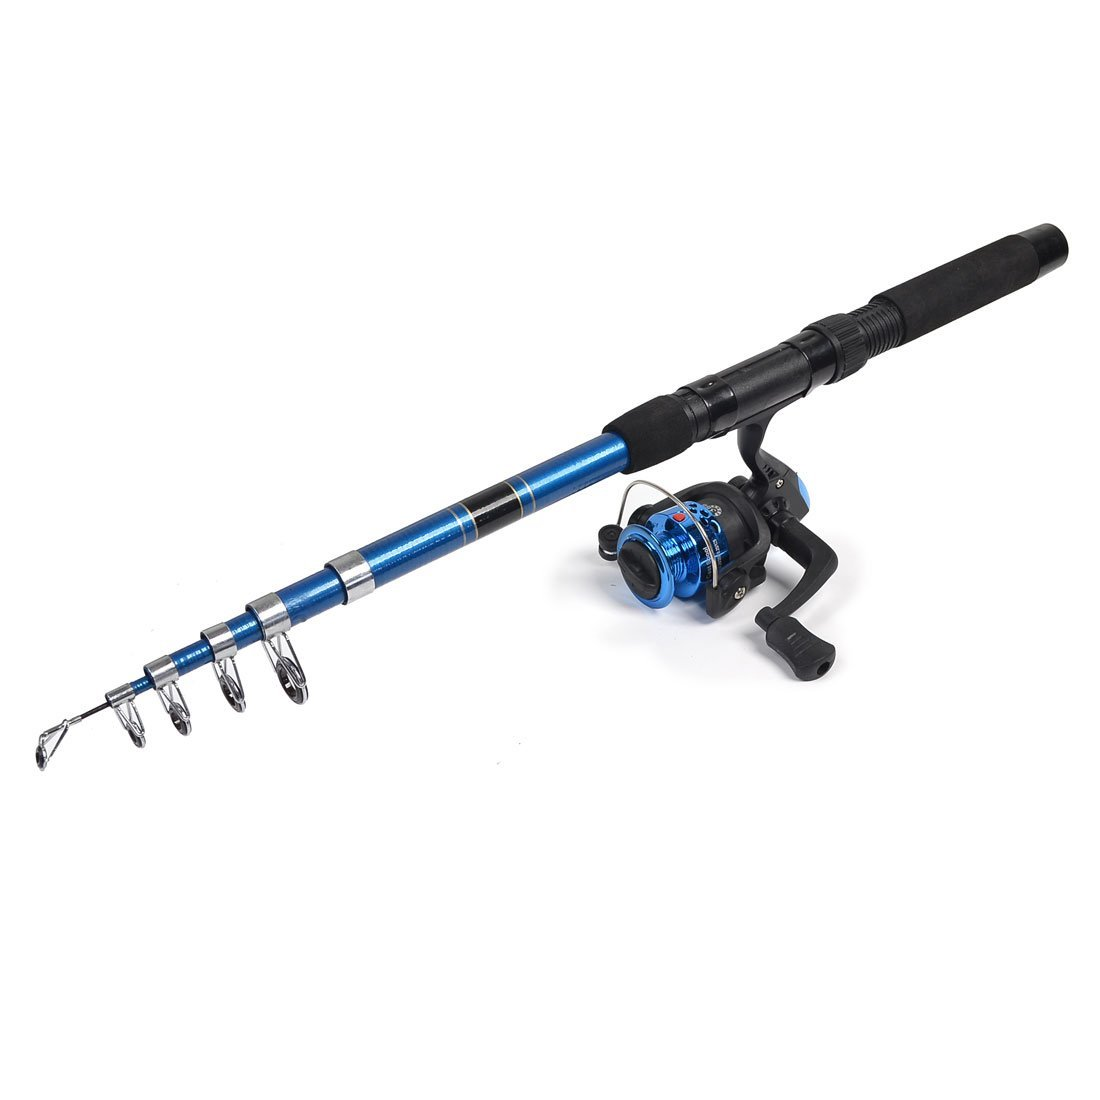 Bleu antid/érapante Grip 2M r/étractable canne /à p/êche 1 Spinning Reel Gear Ratio 5.2